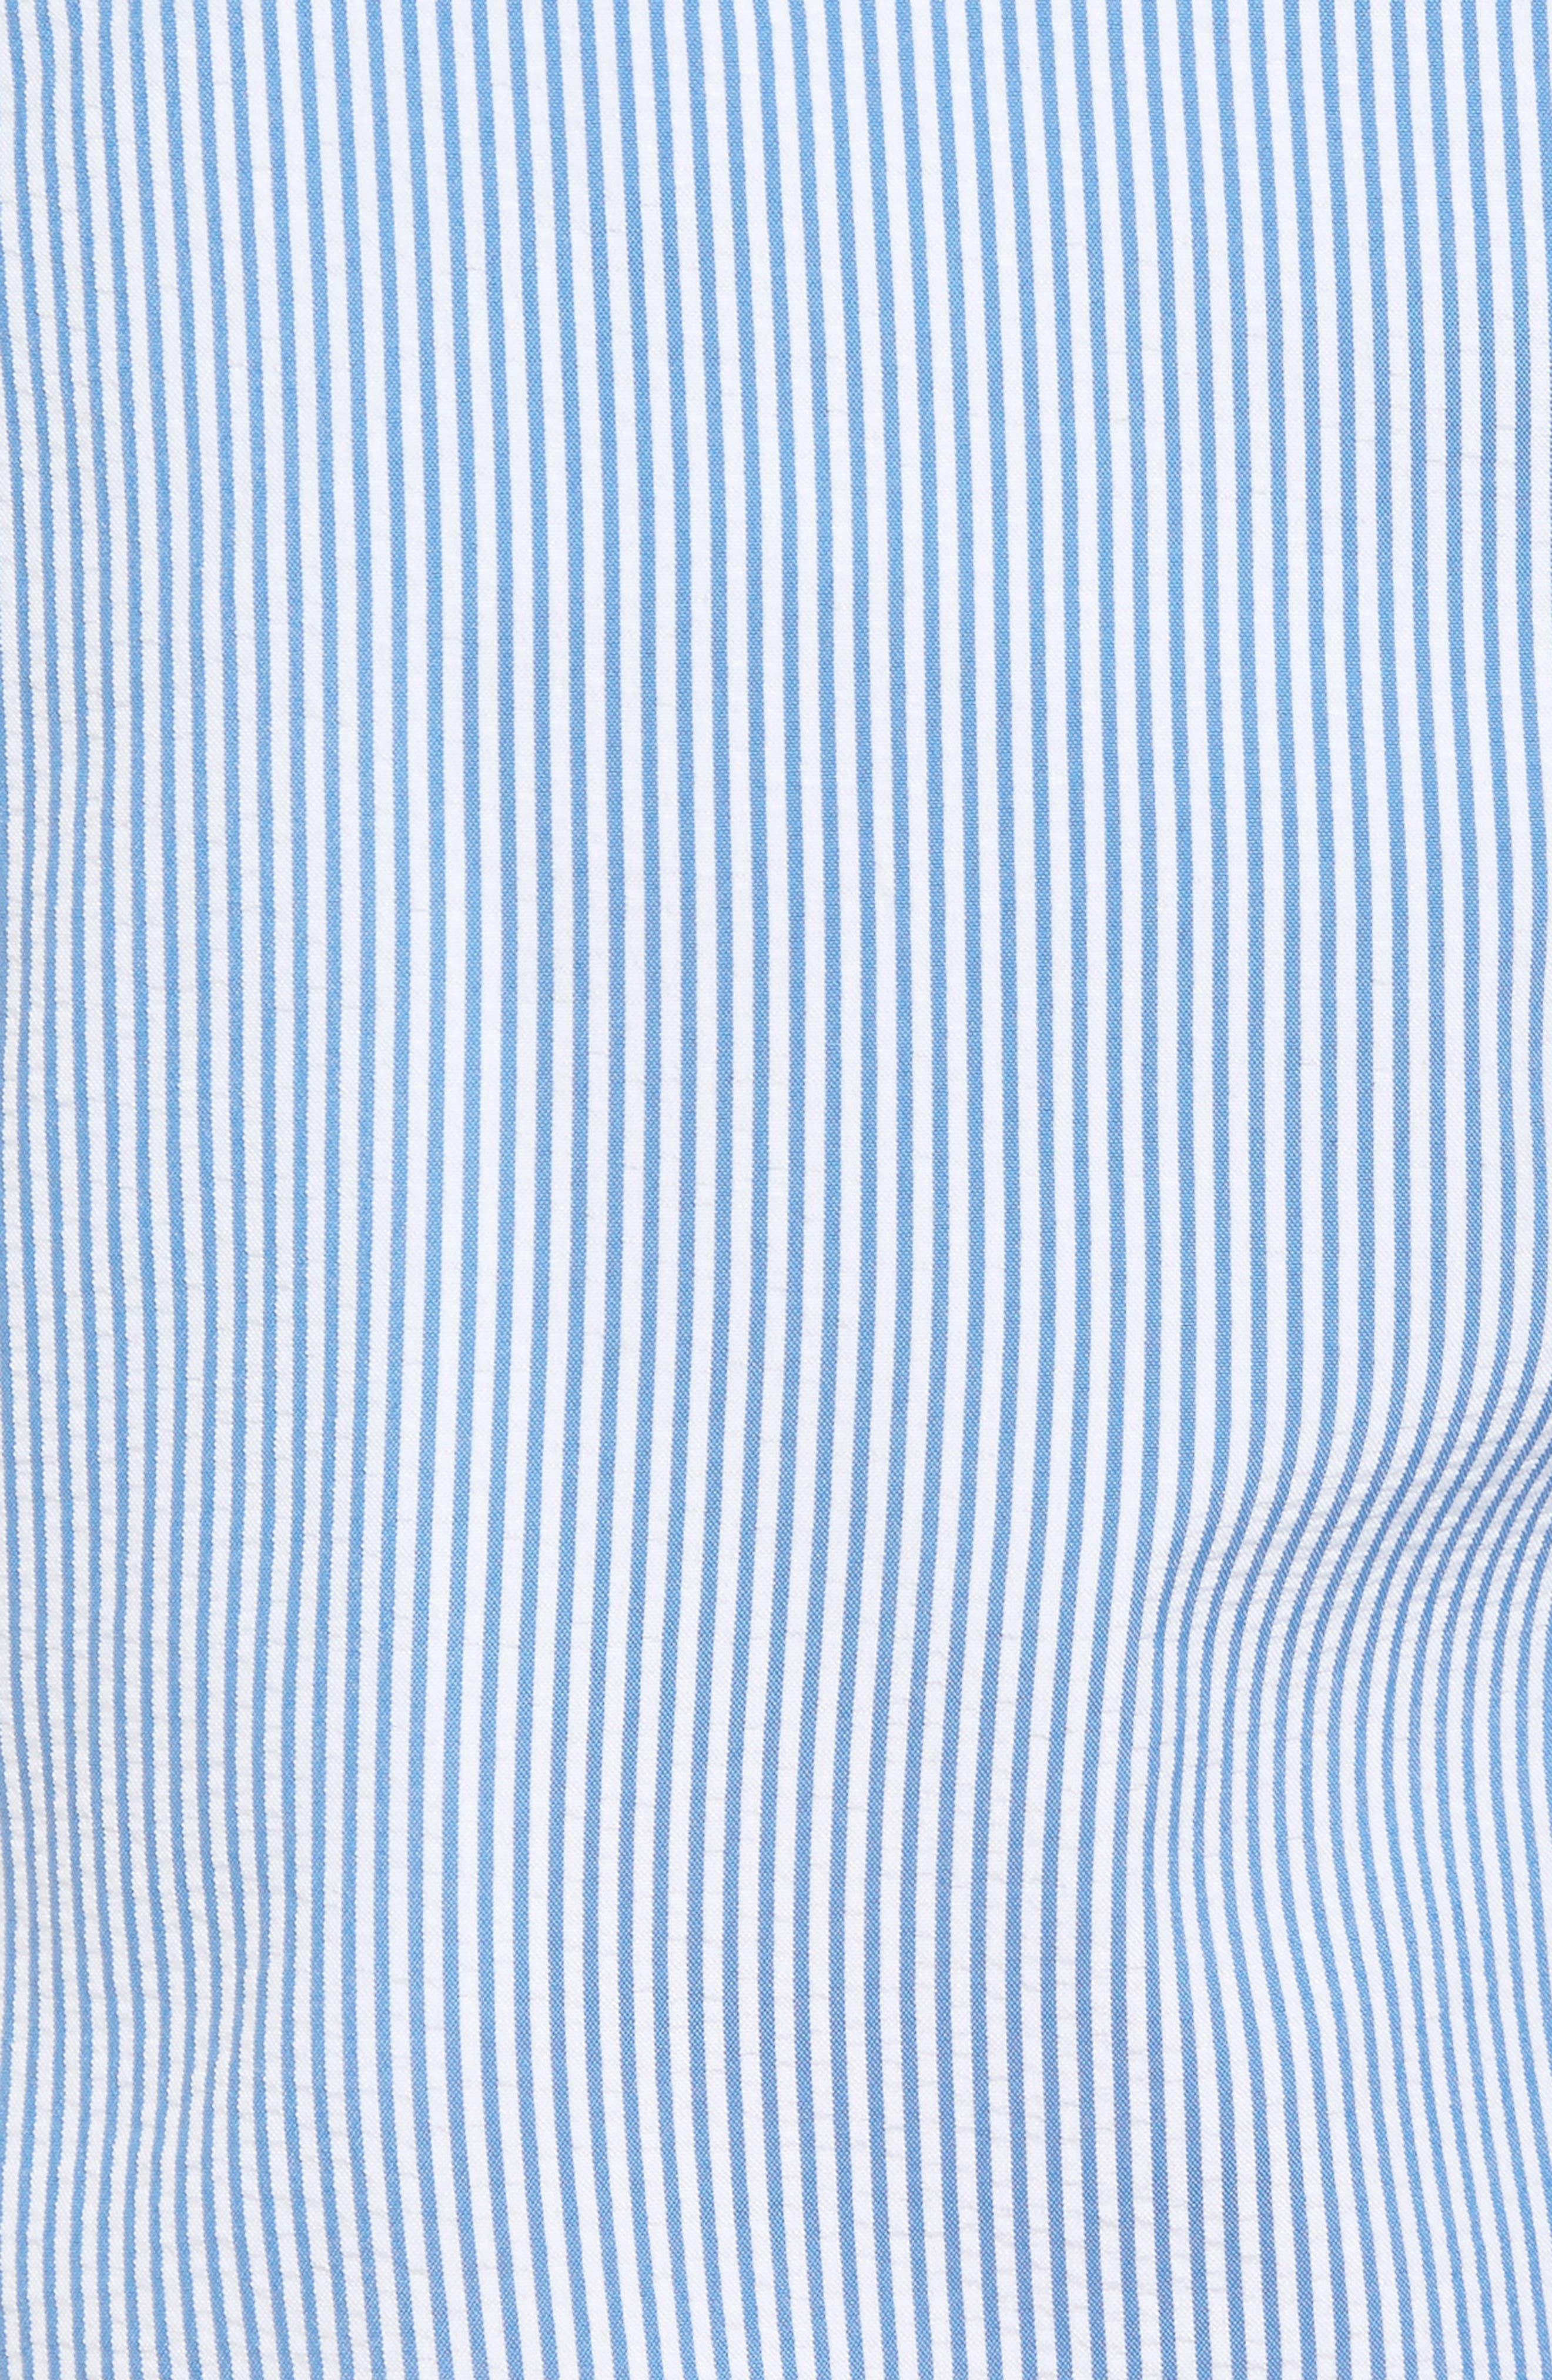 San O Stripe Swim Trunks,                             Alternate thumbnail 5, color,                             Nautical Blue/ White